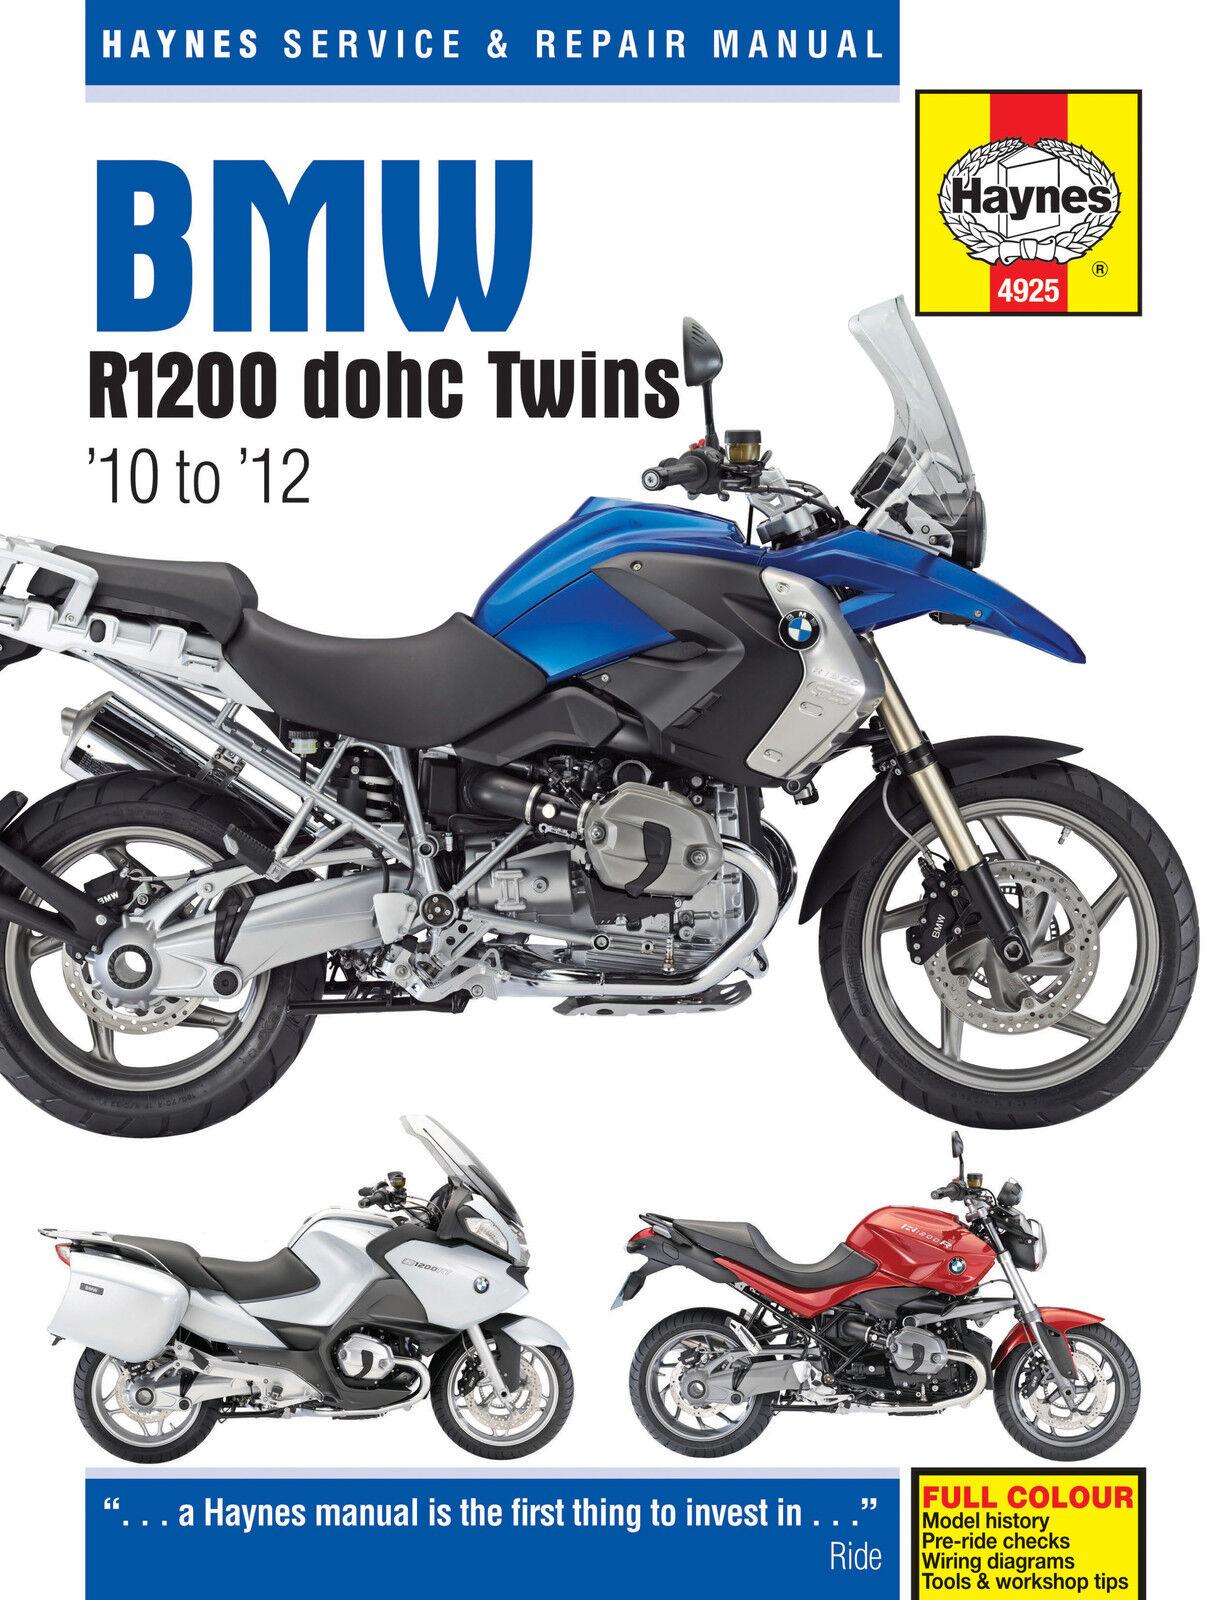 HAYNES 4925 WORKSHOP SERVICE REPAIR MANUAL BMW R1200 DOHC TWINS 2010 - 2012